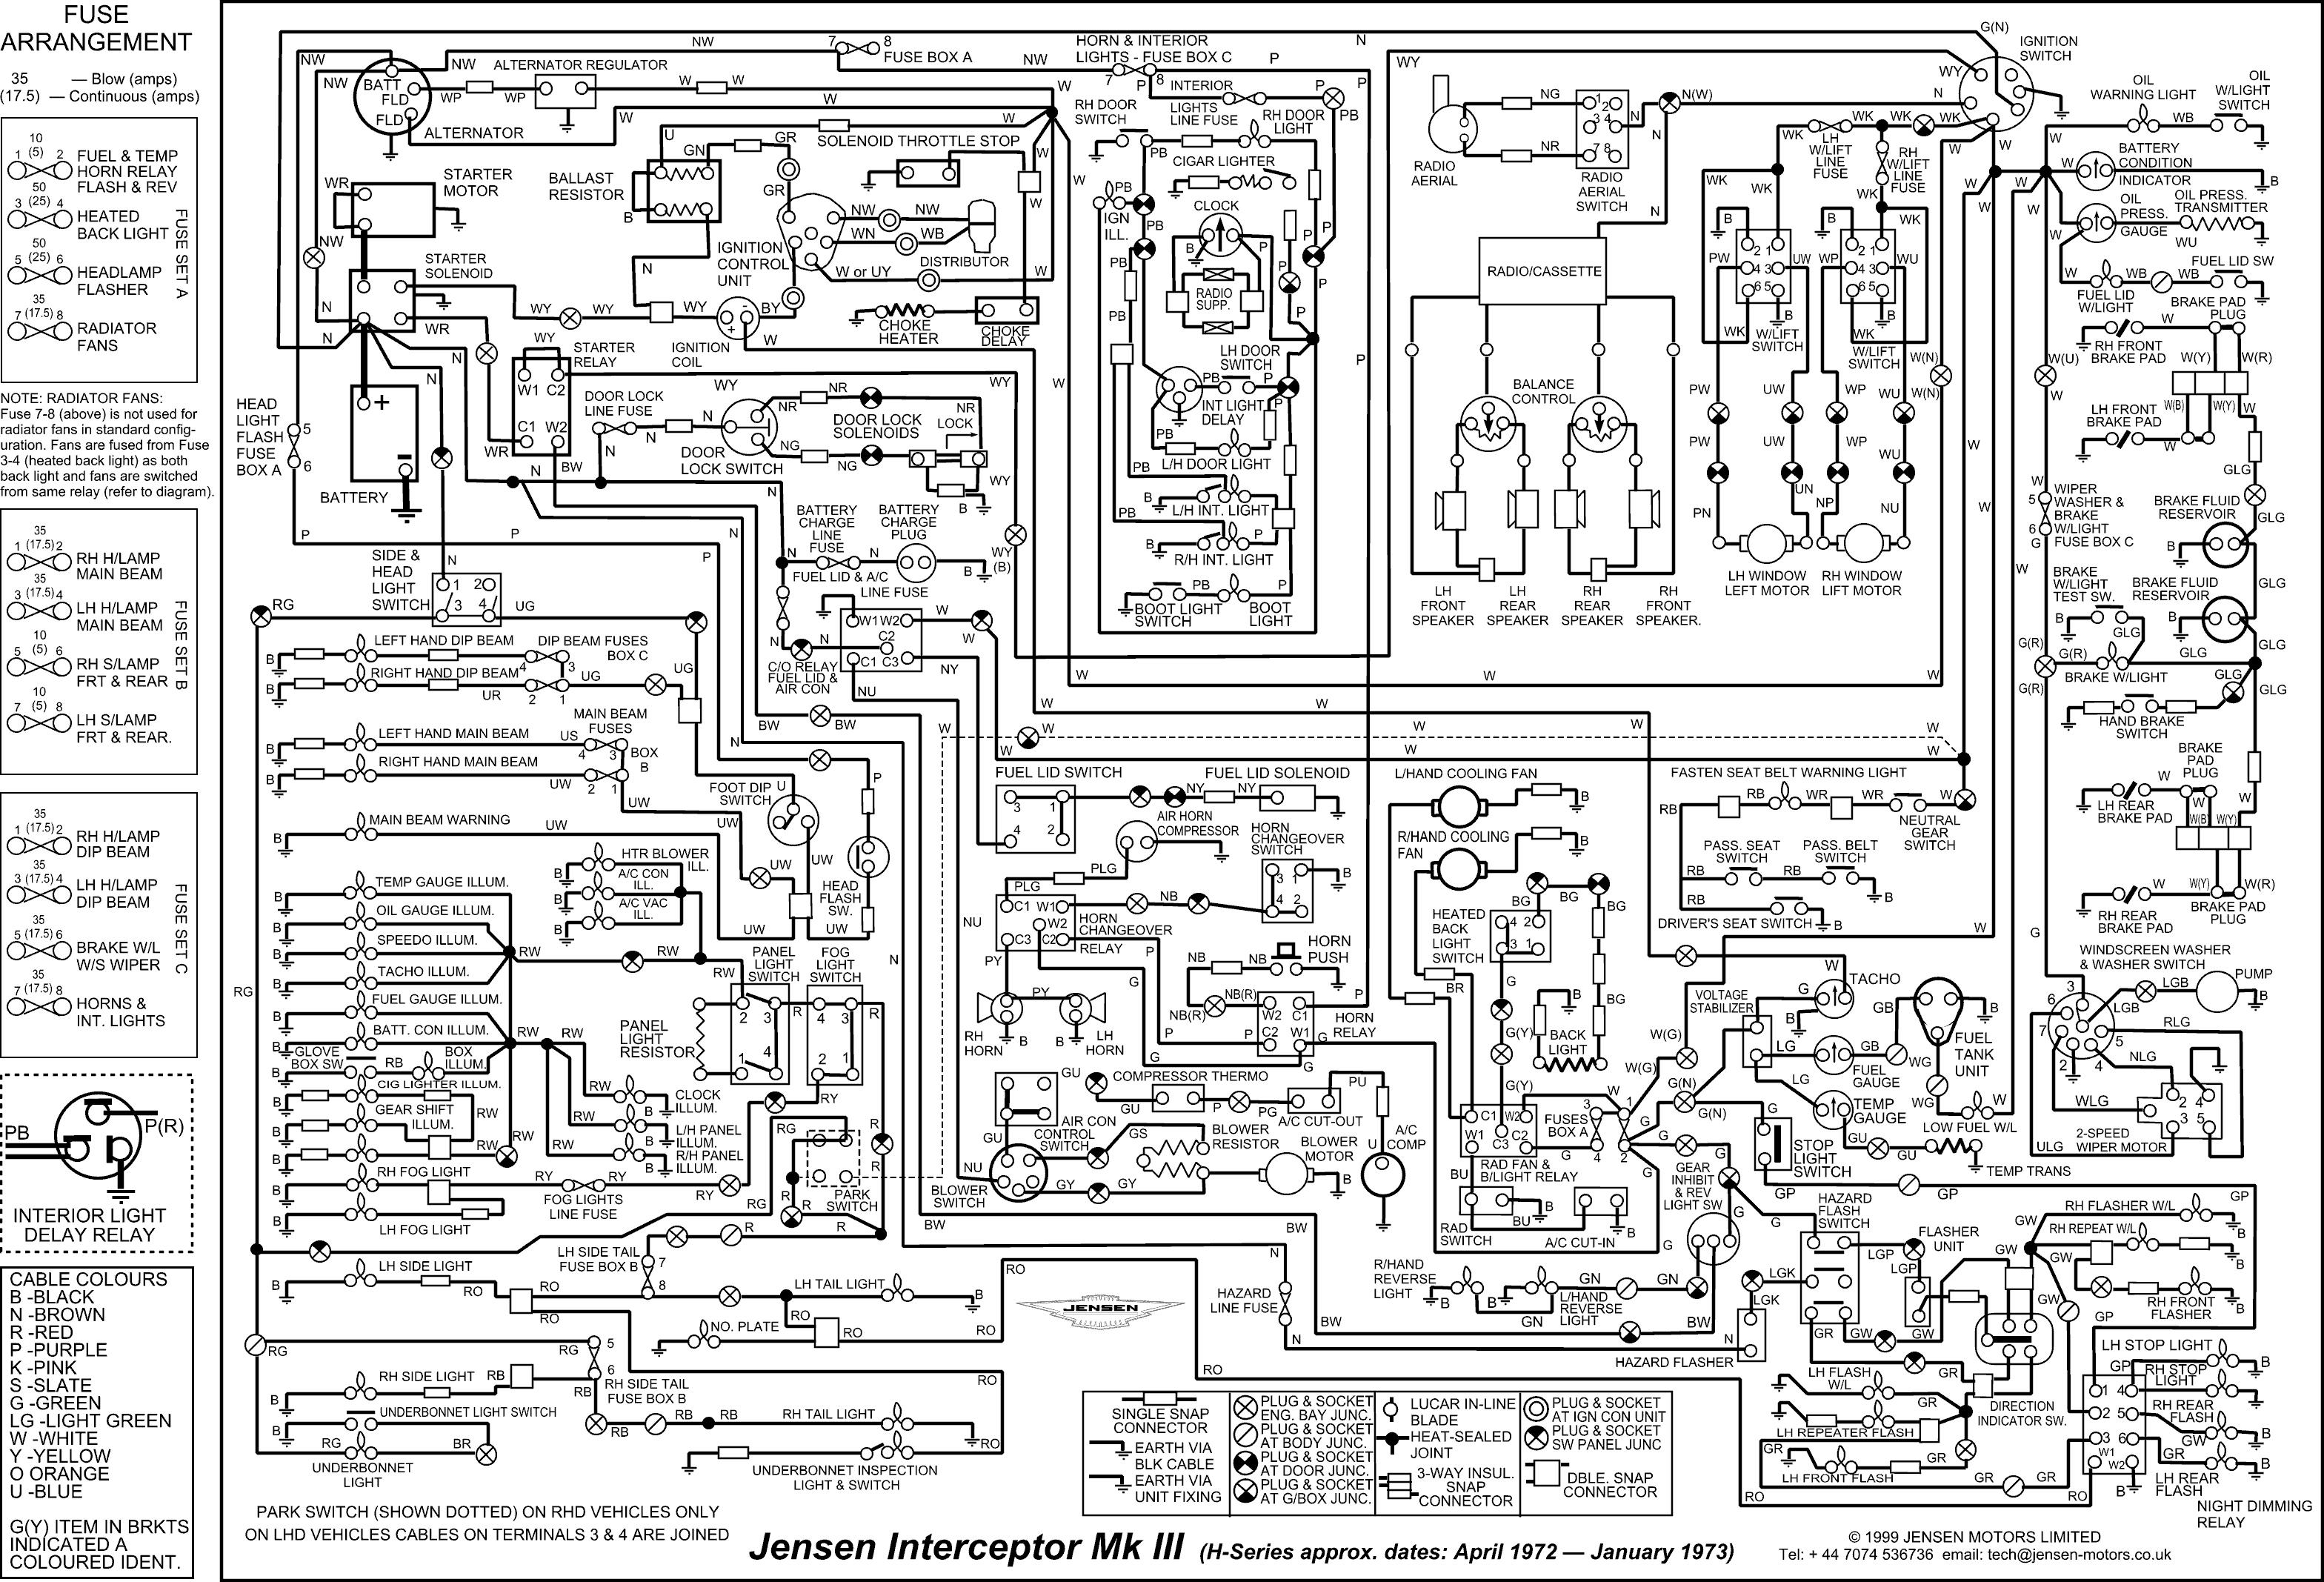 jensen wiring diagram vm9311 tekonsha prodigy p3 interceptor iii h series flickr